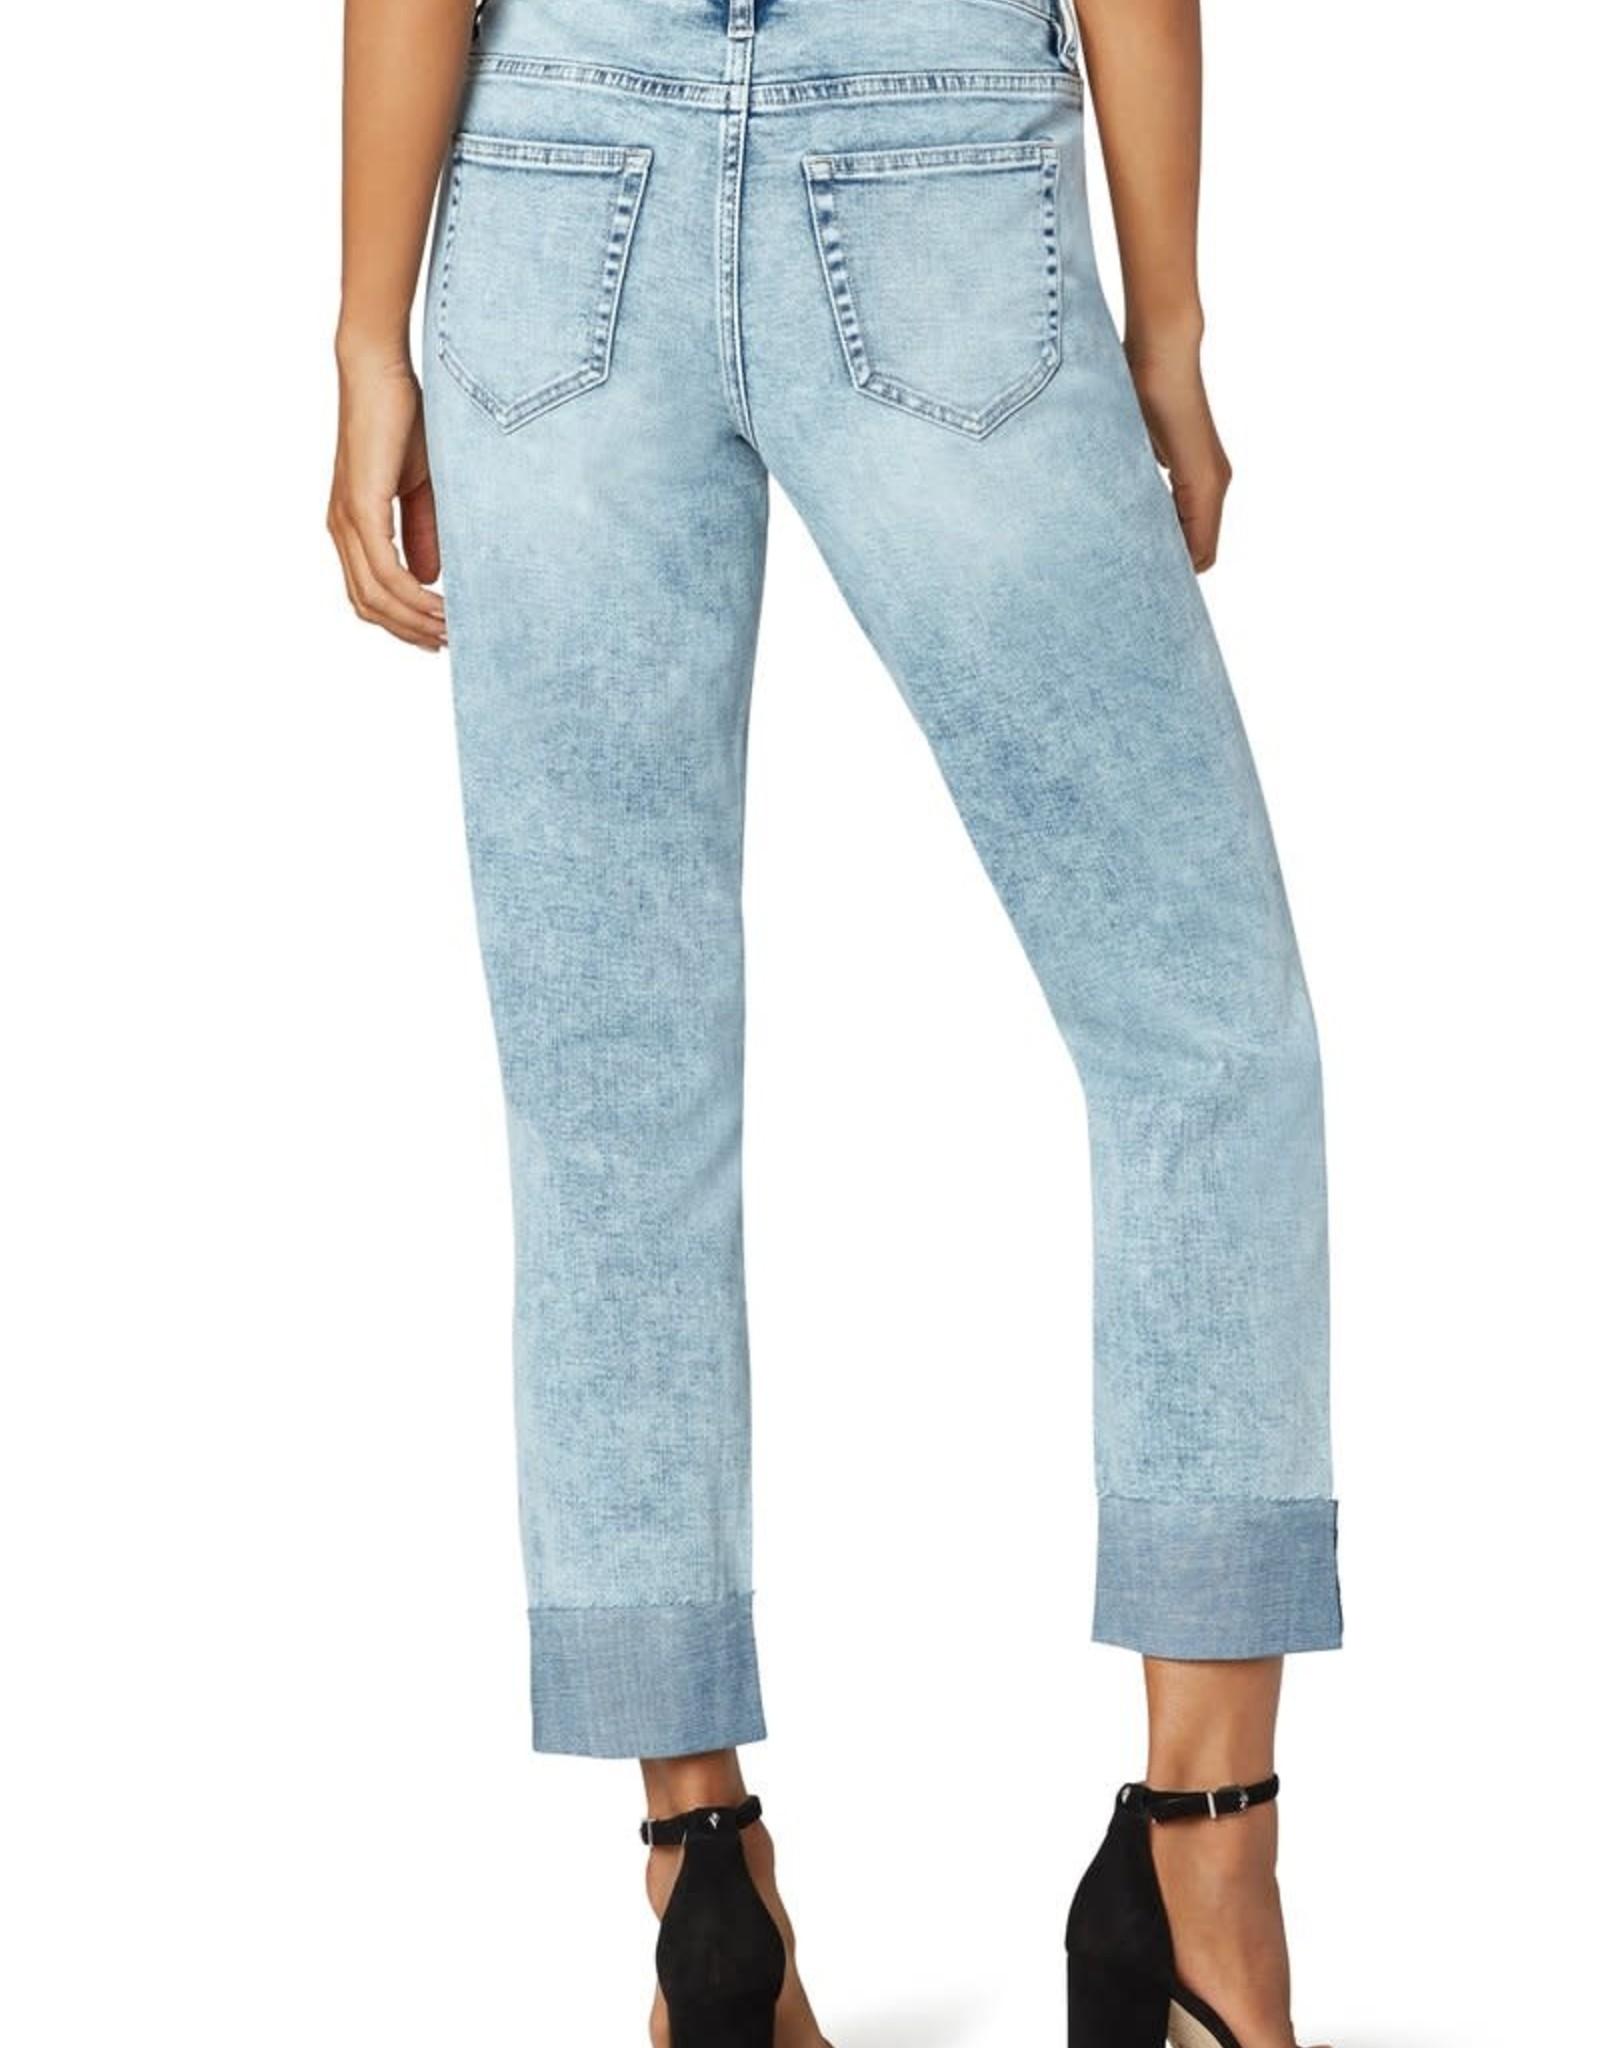 Liverpool LM5602SS8  Marley Girlfriend Raw Cuff Jeans